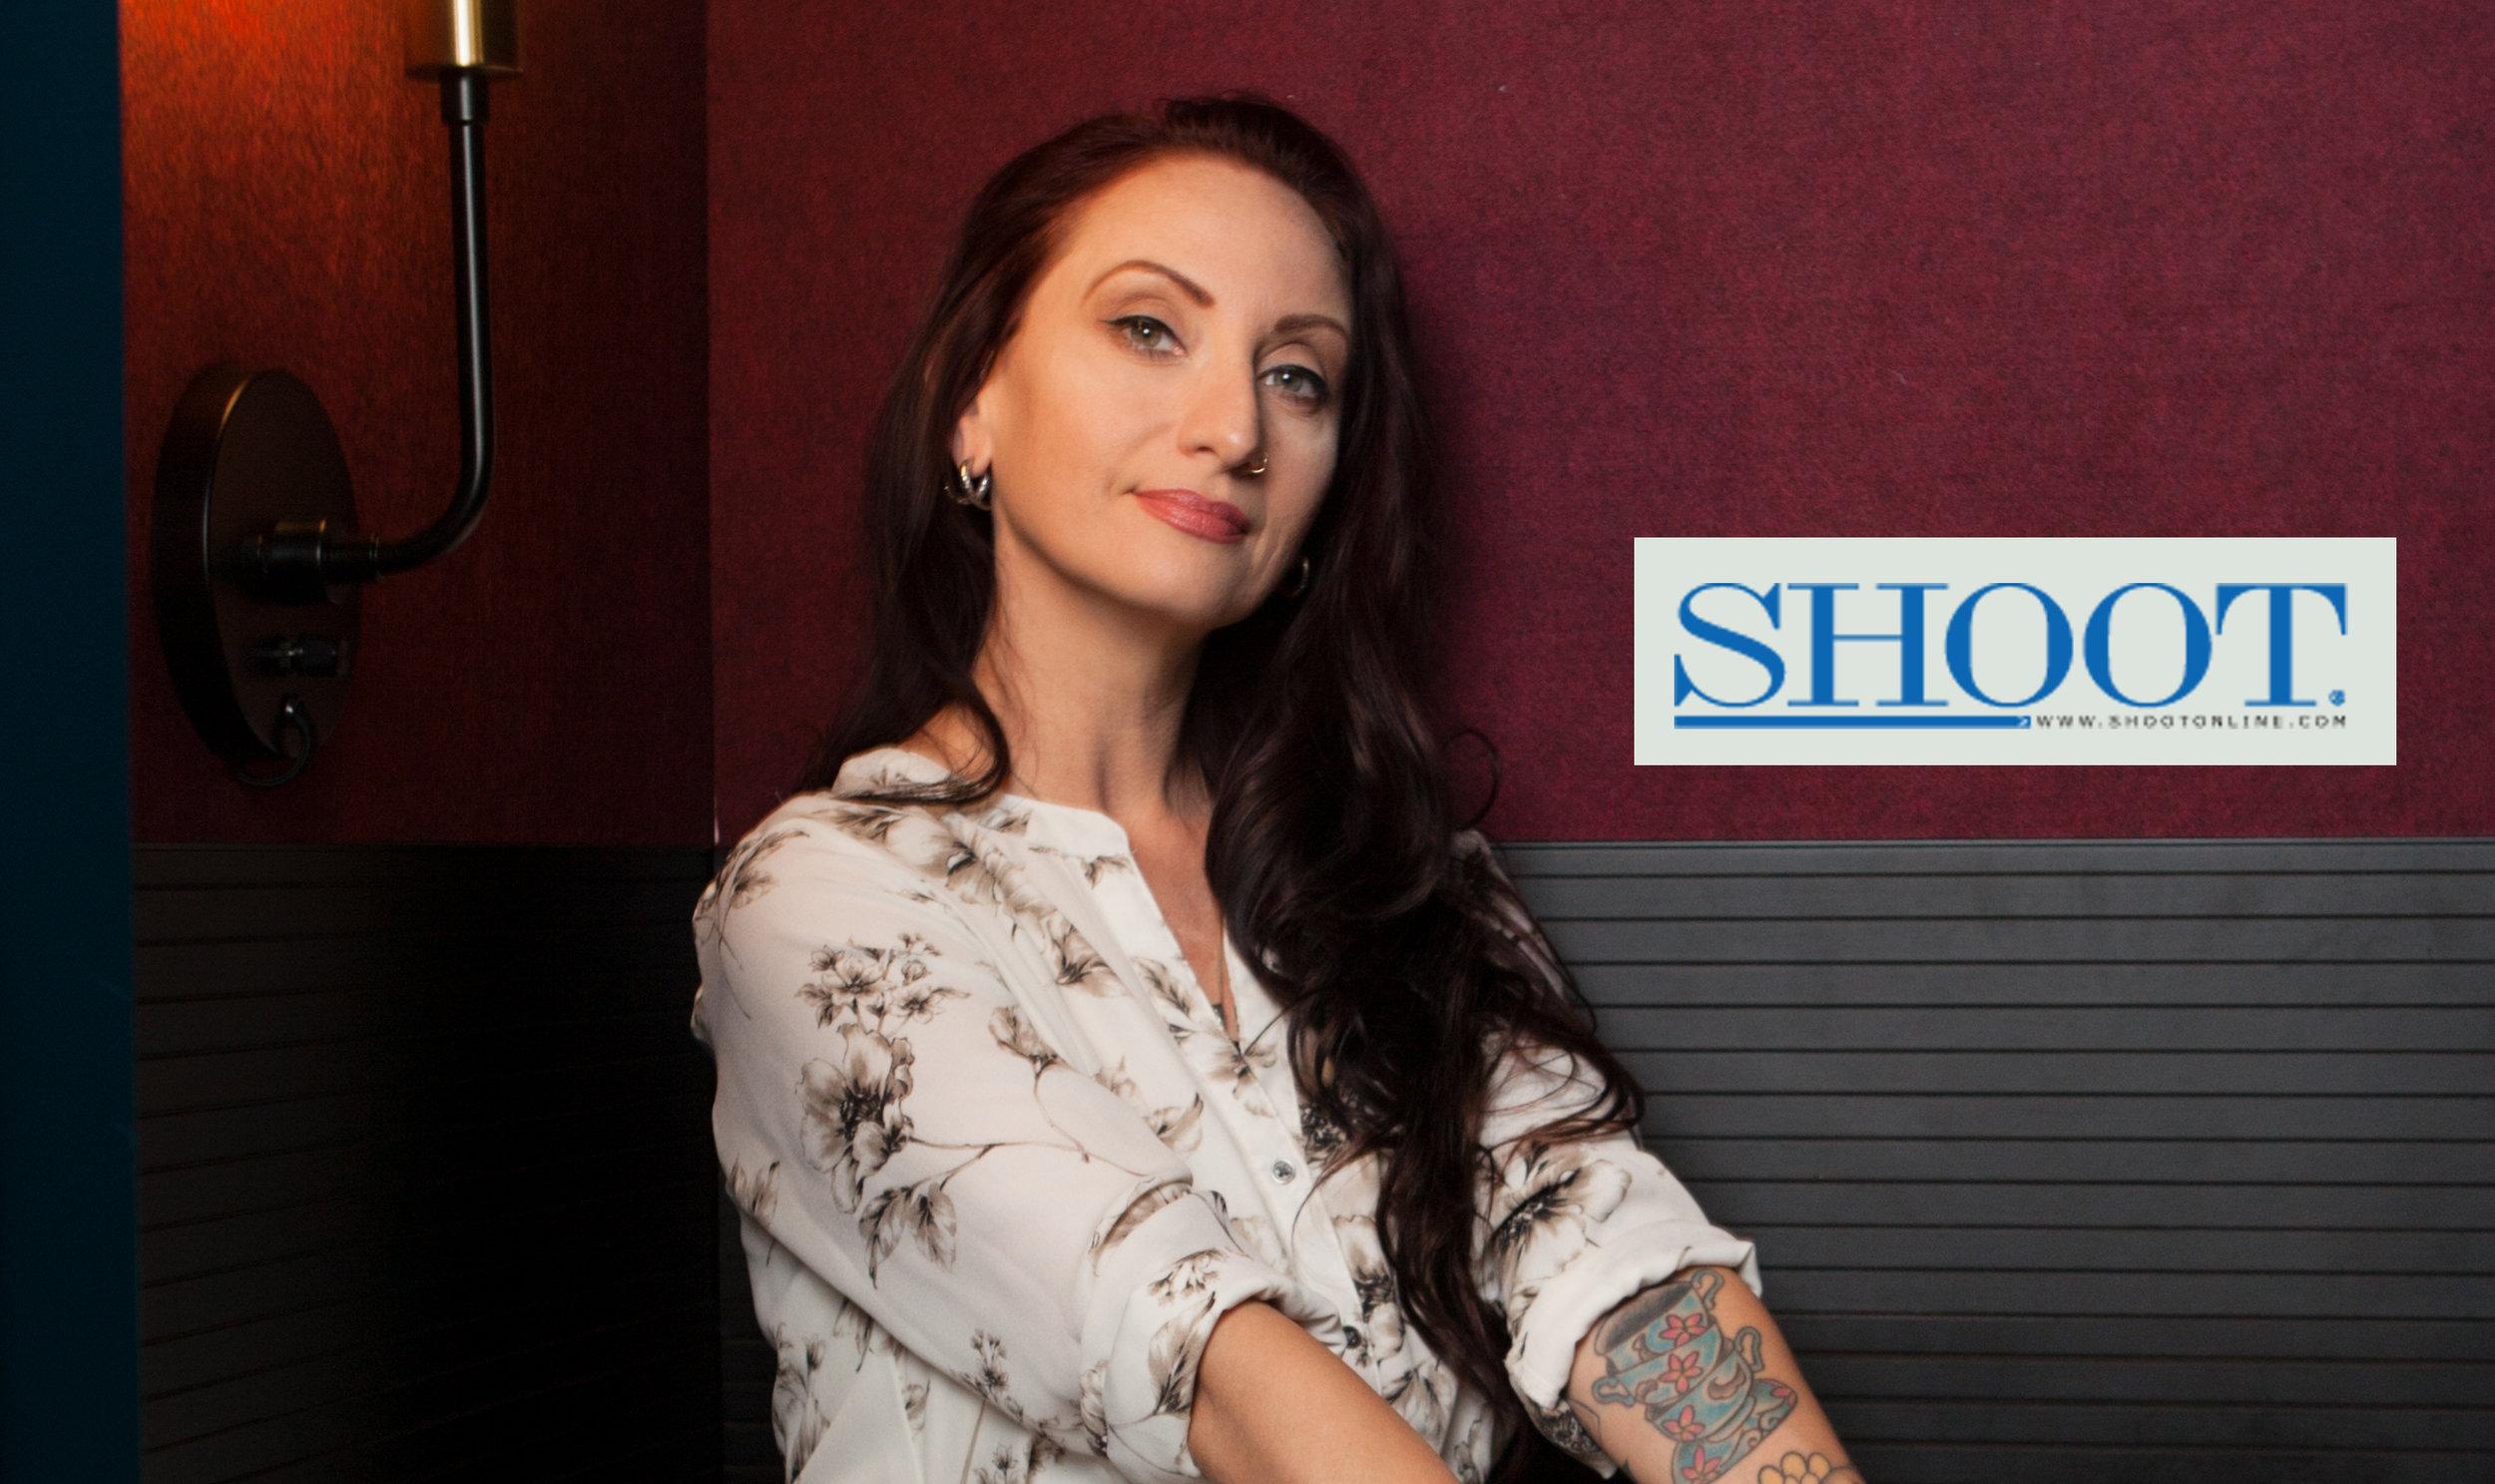 Jessica_w_shoot_logo.jpg